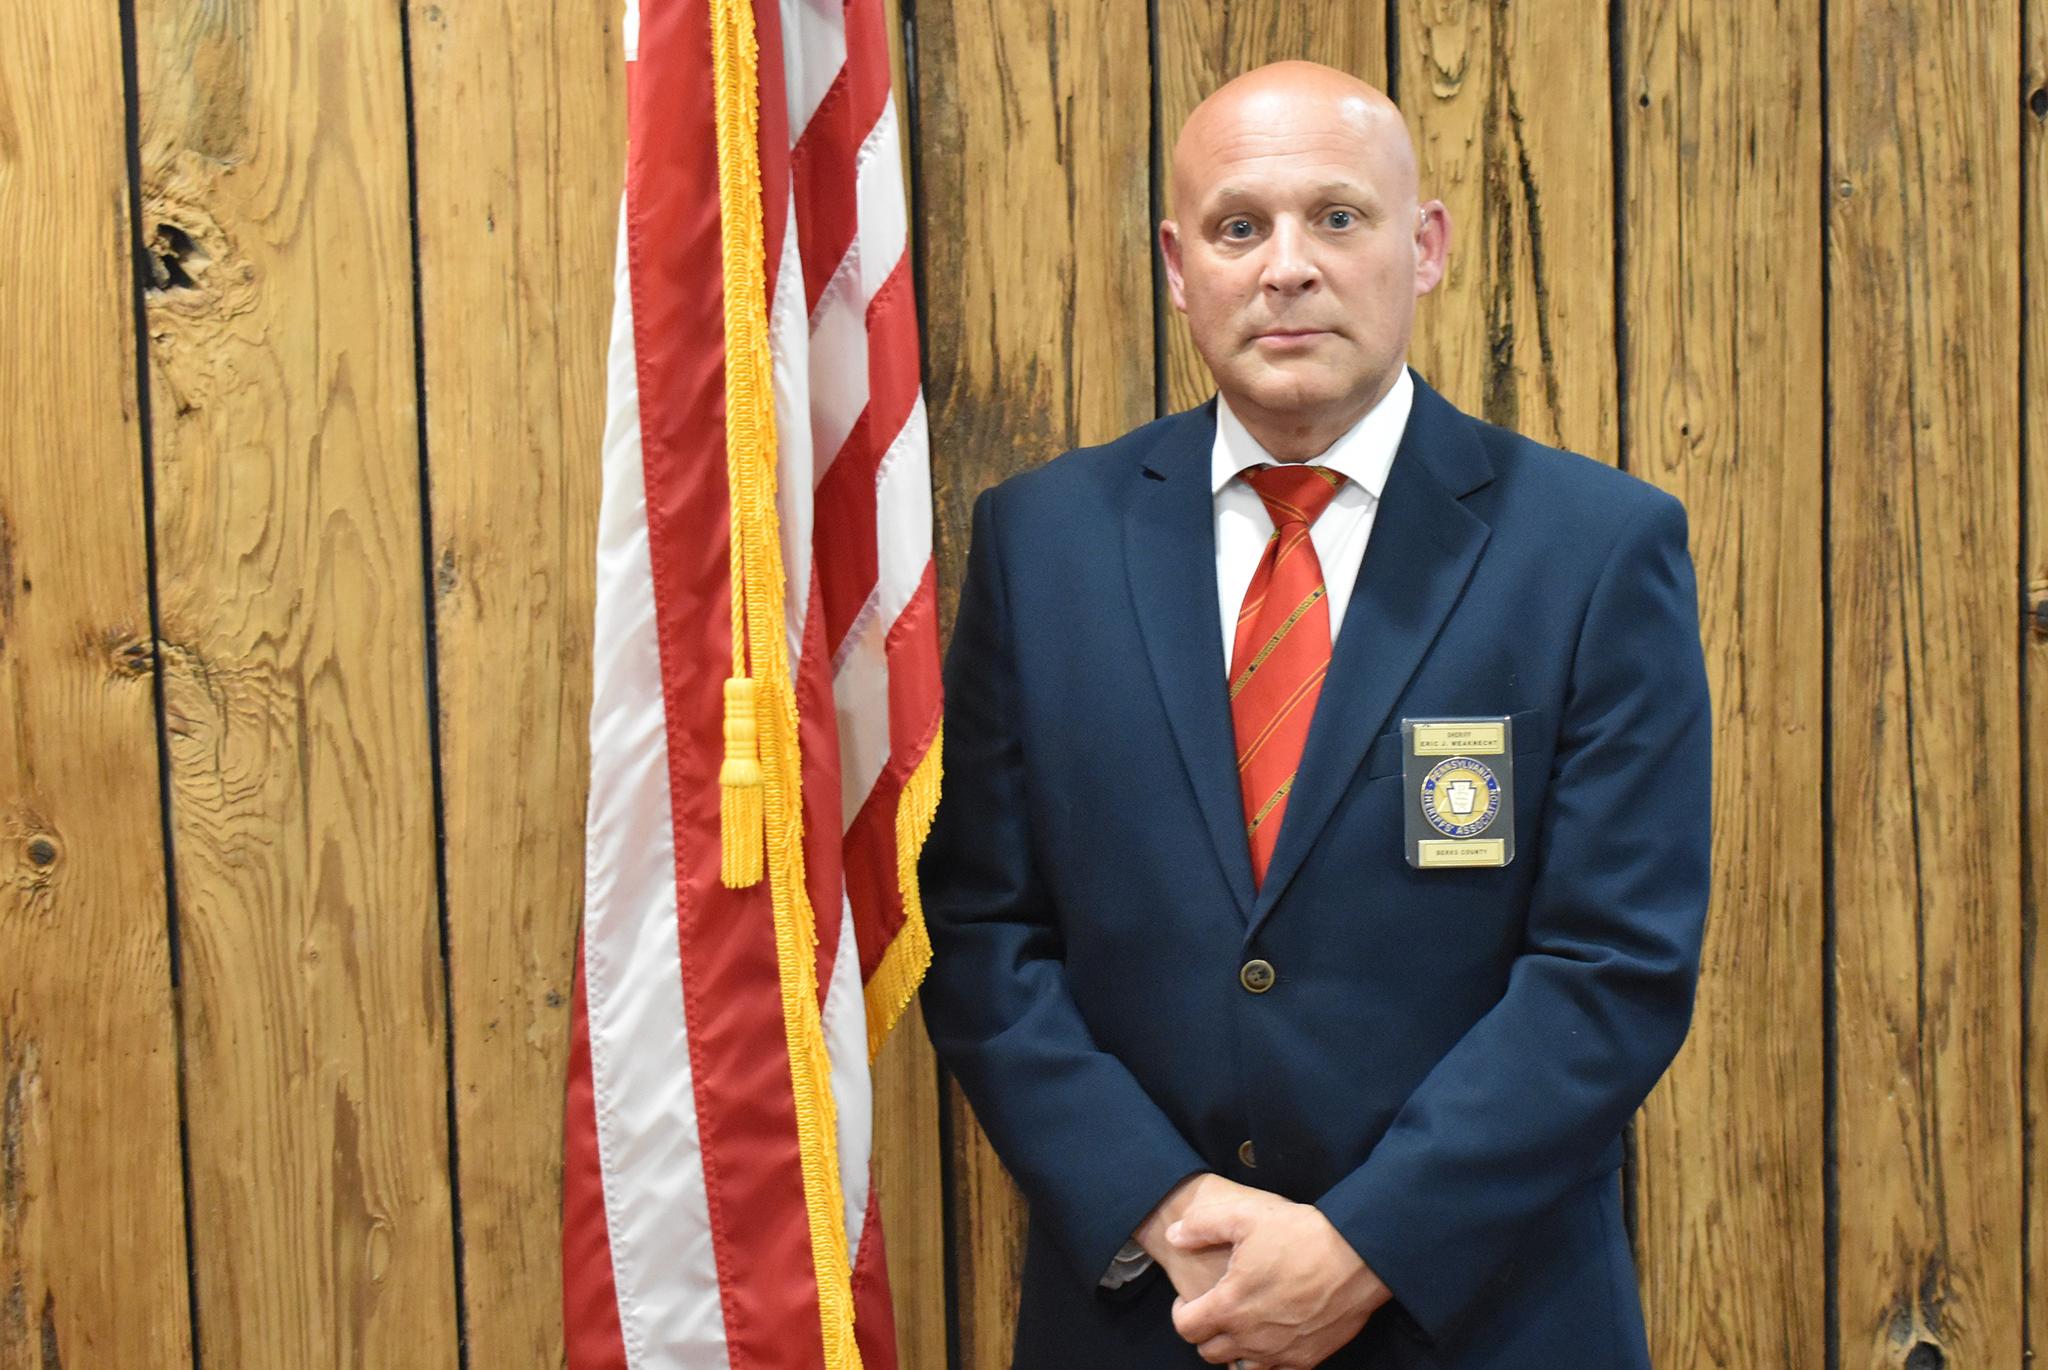 Sheriff Eric J. Weaknecht